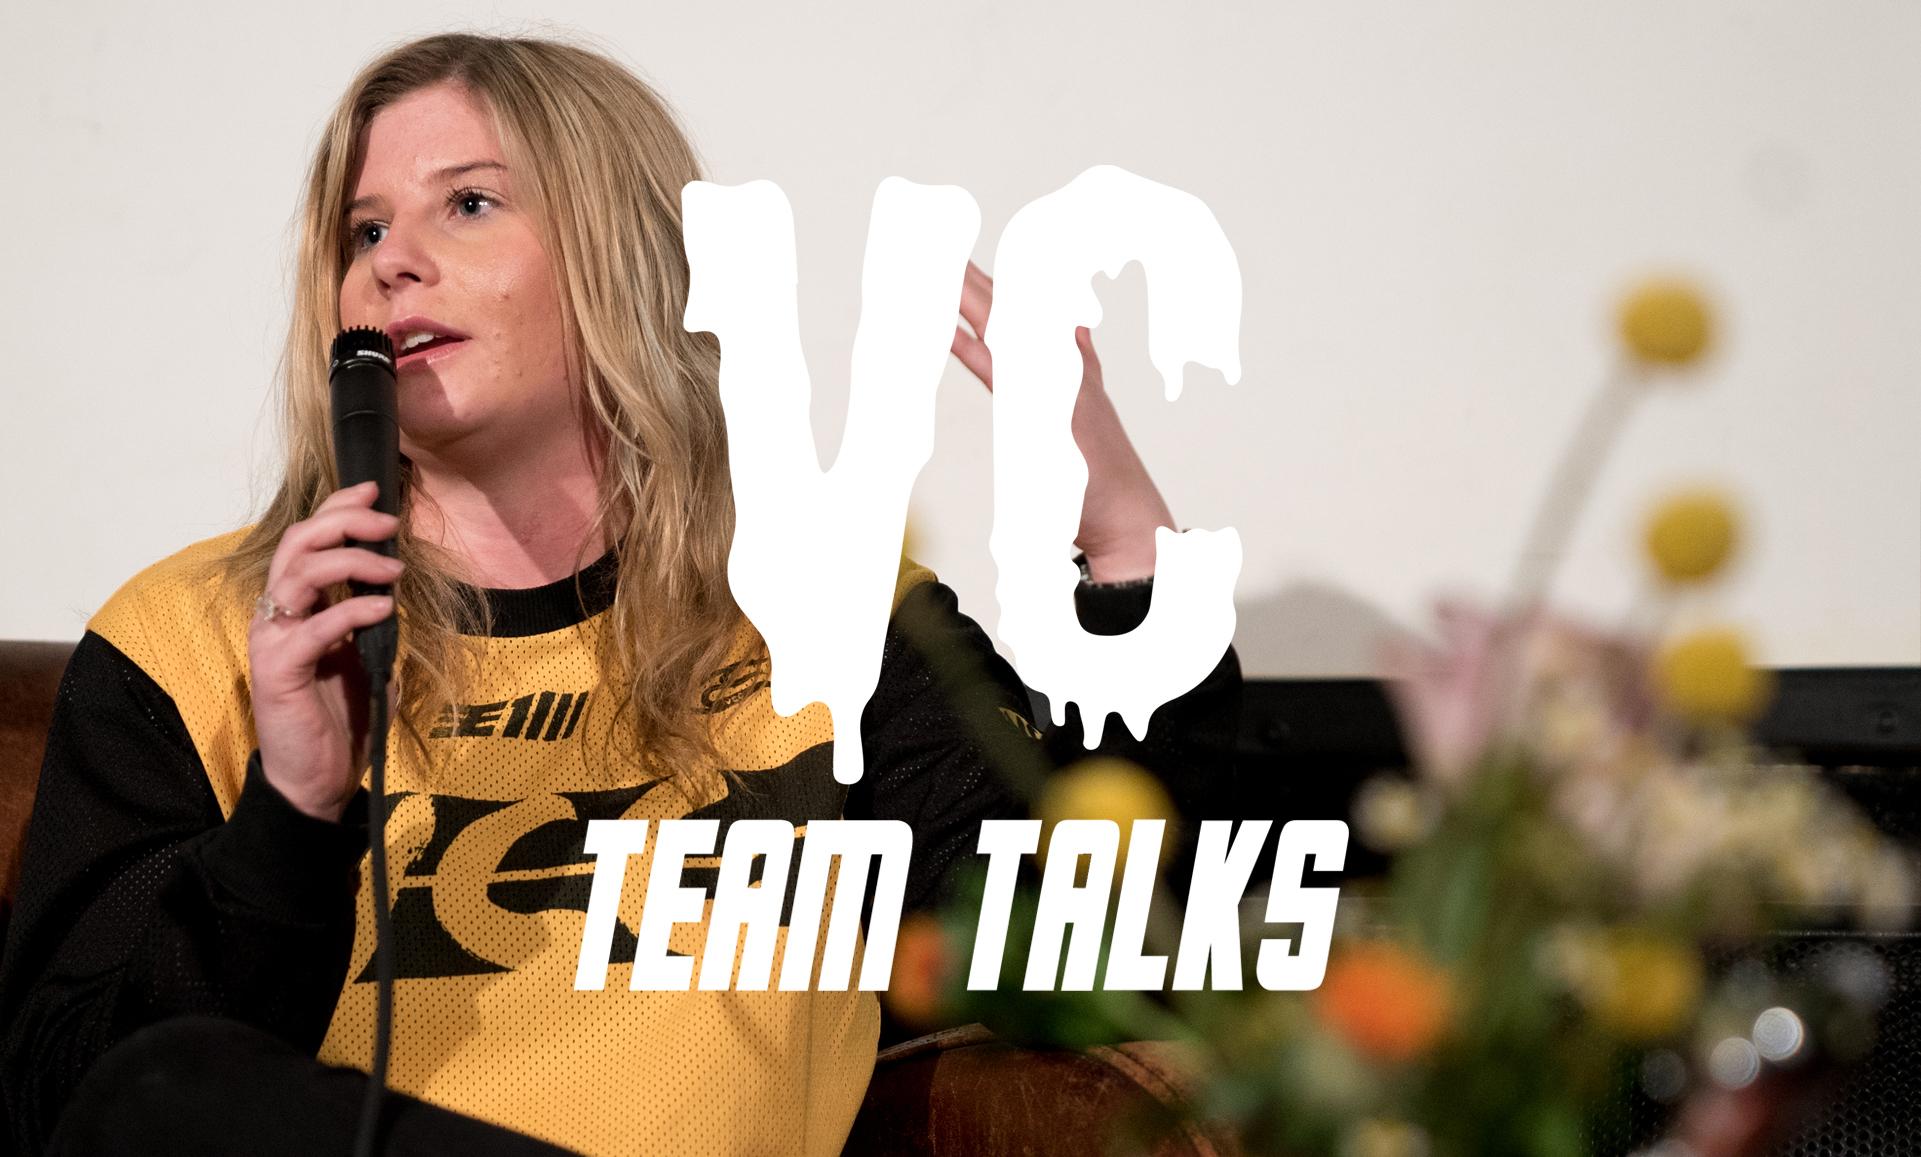 vc+team+talks+leah+tokelove.jpg